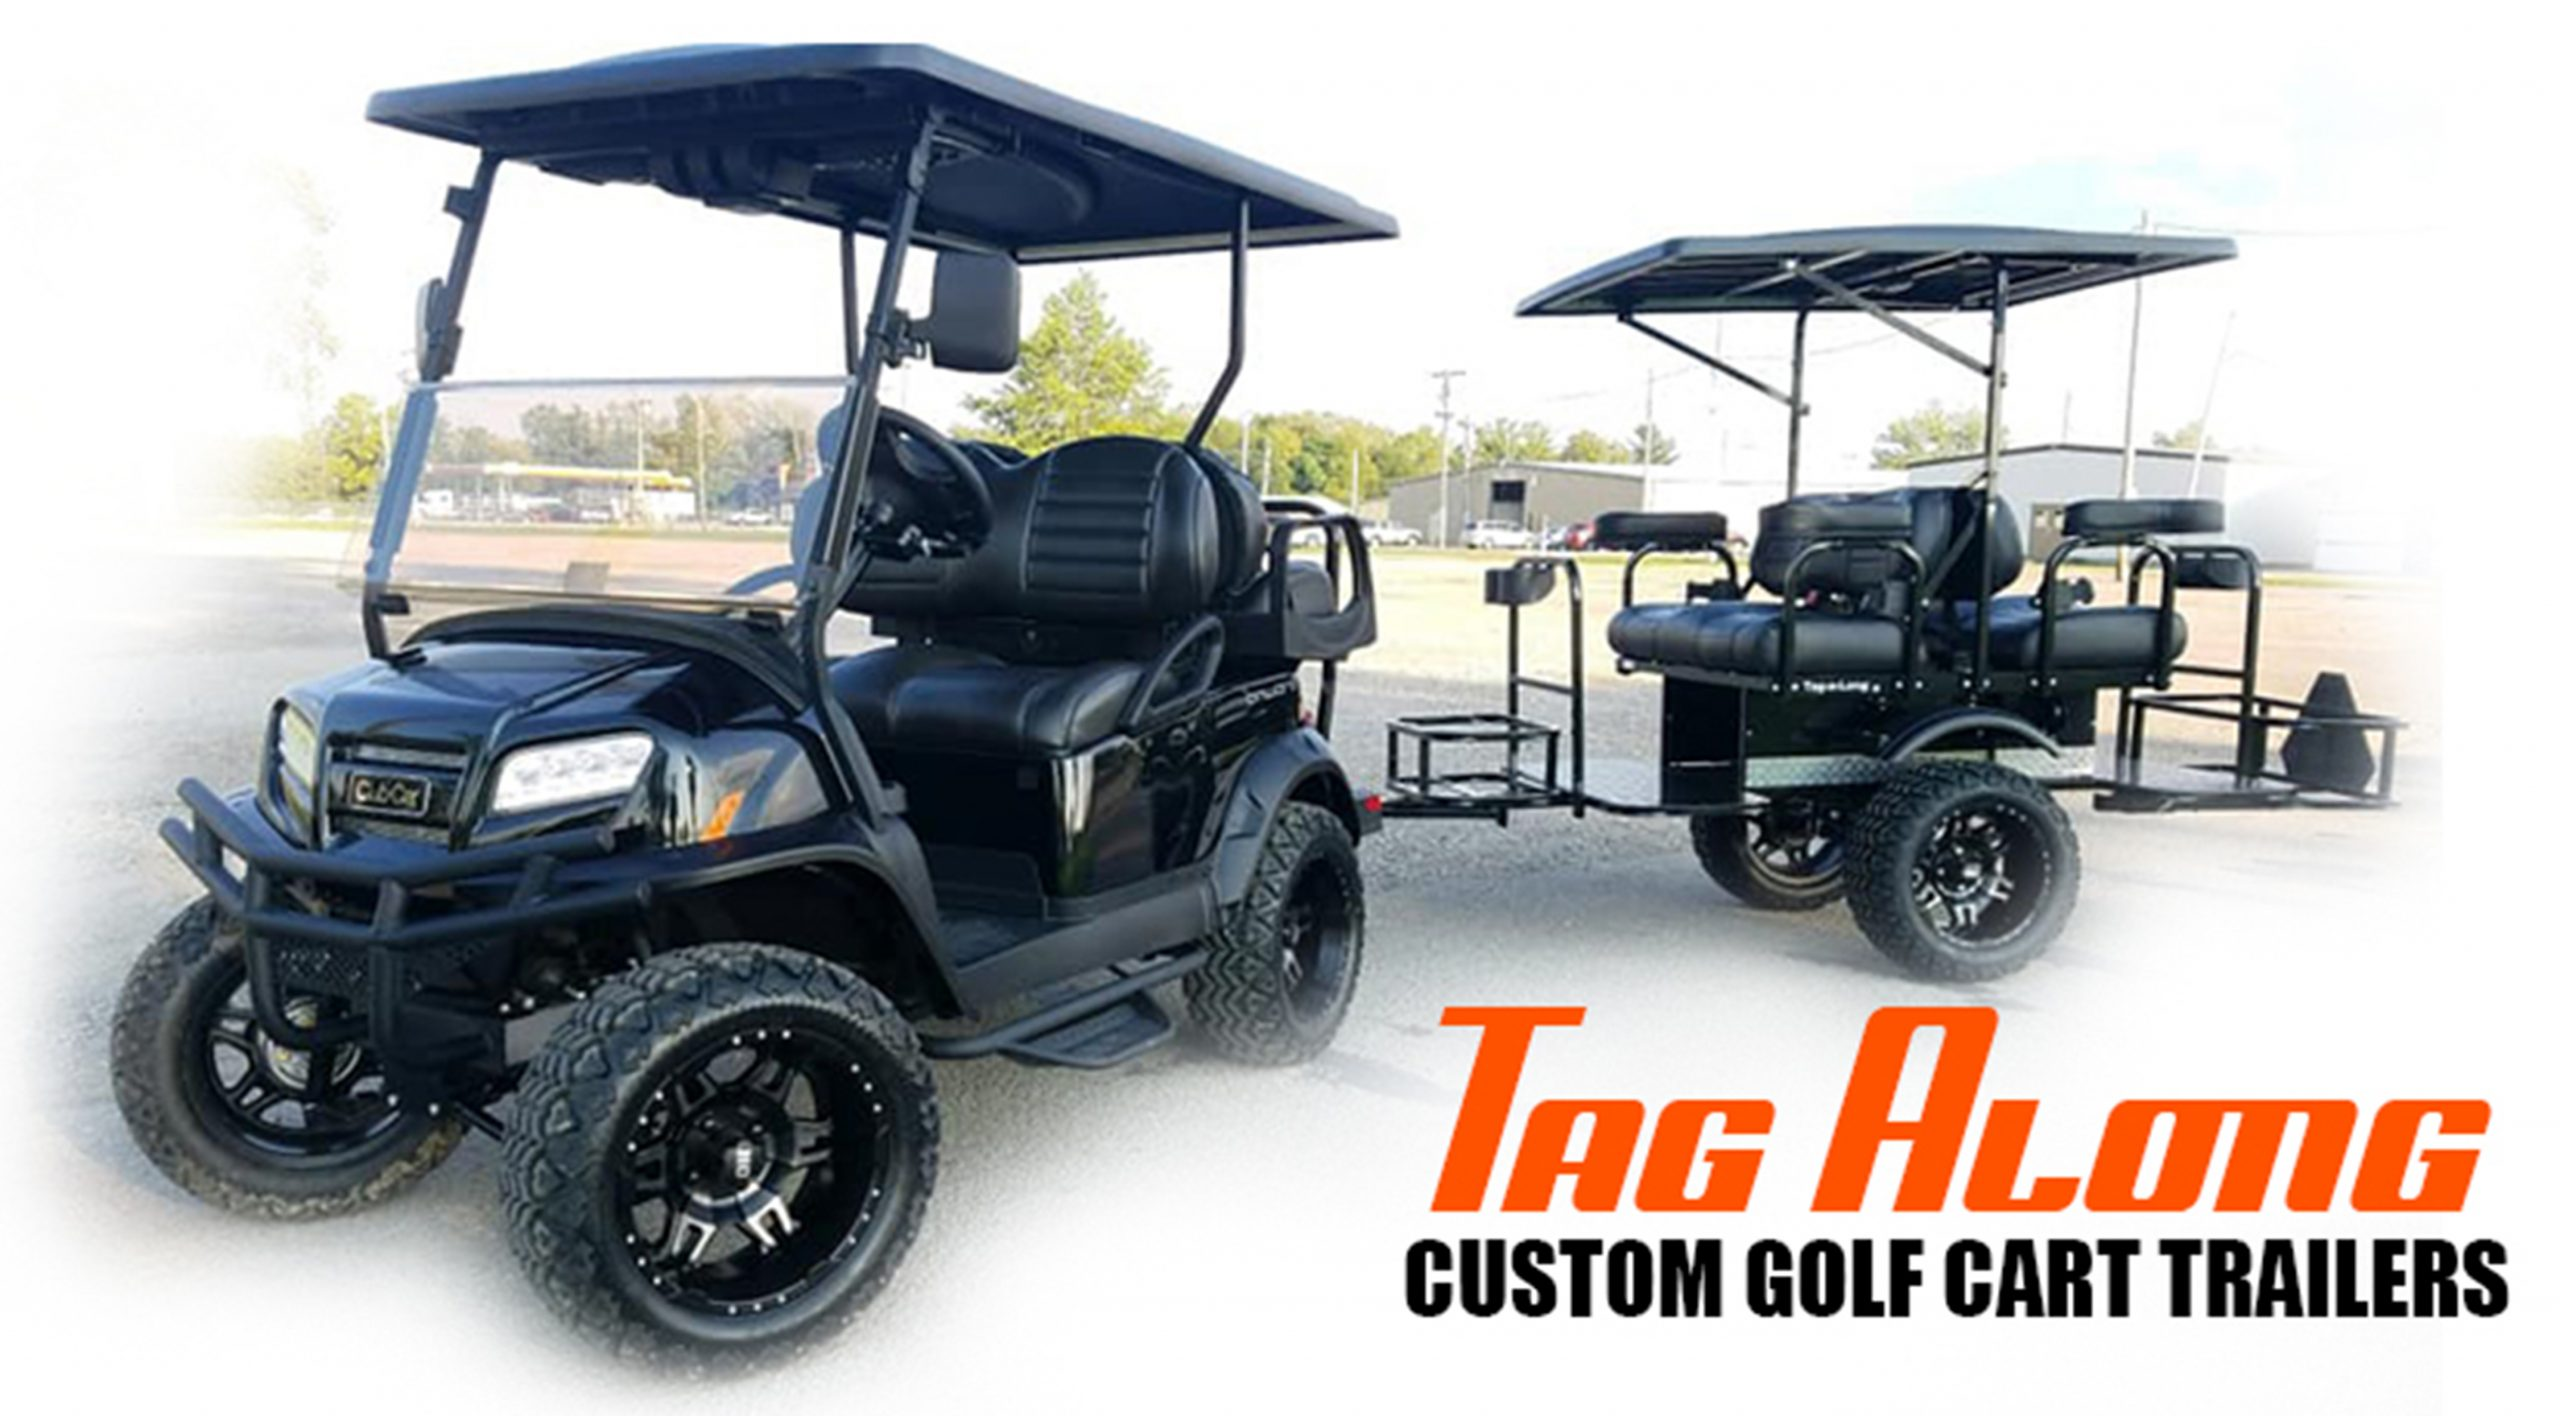 Golf Car Options A Conversation With Tim Osborn President Tag Along Carts